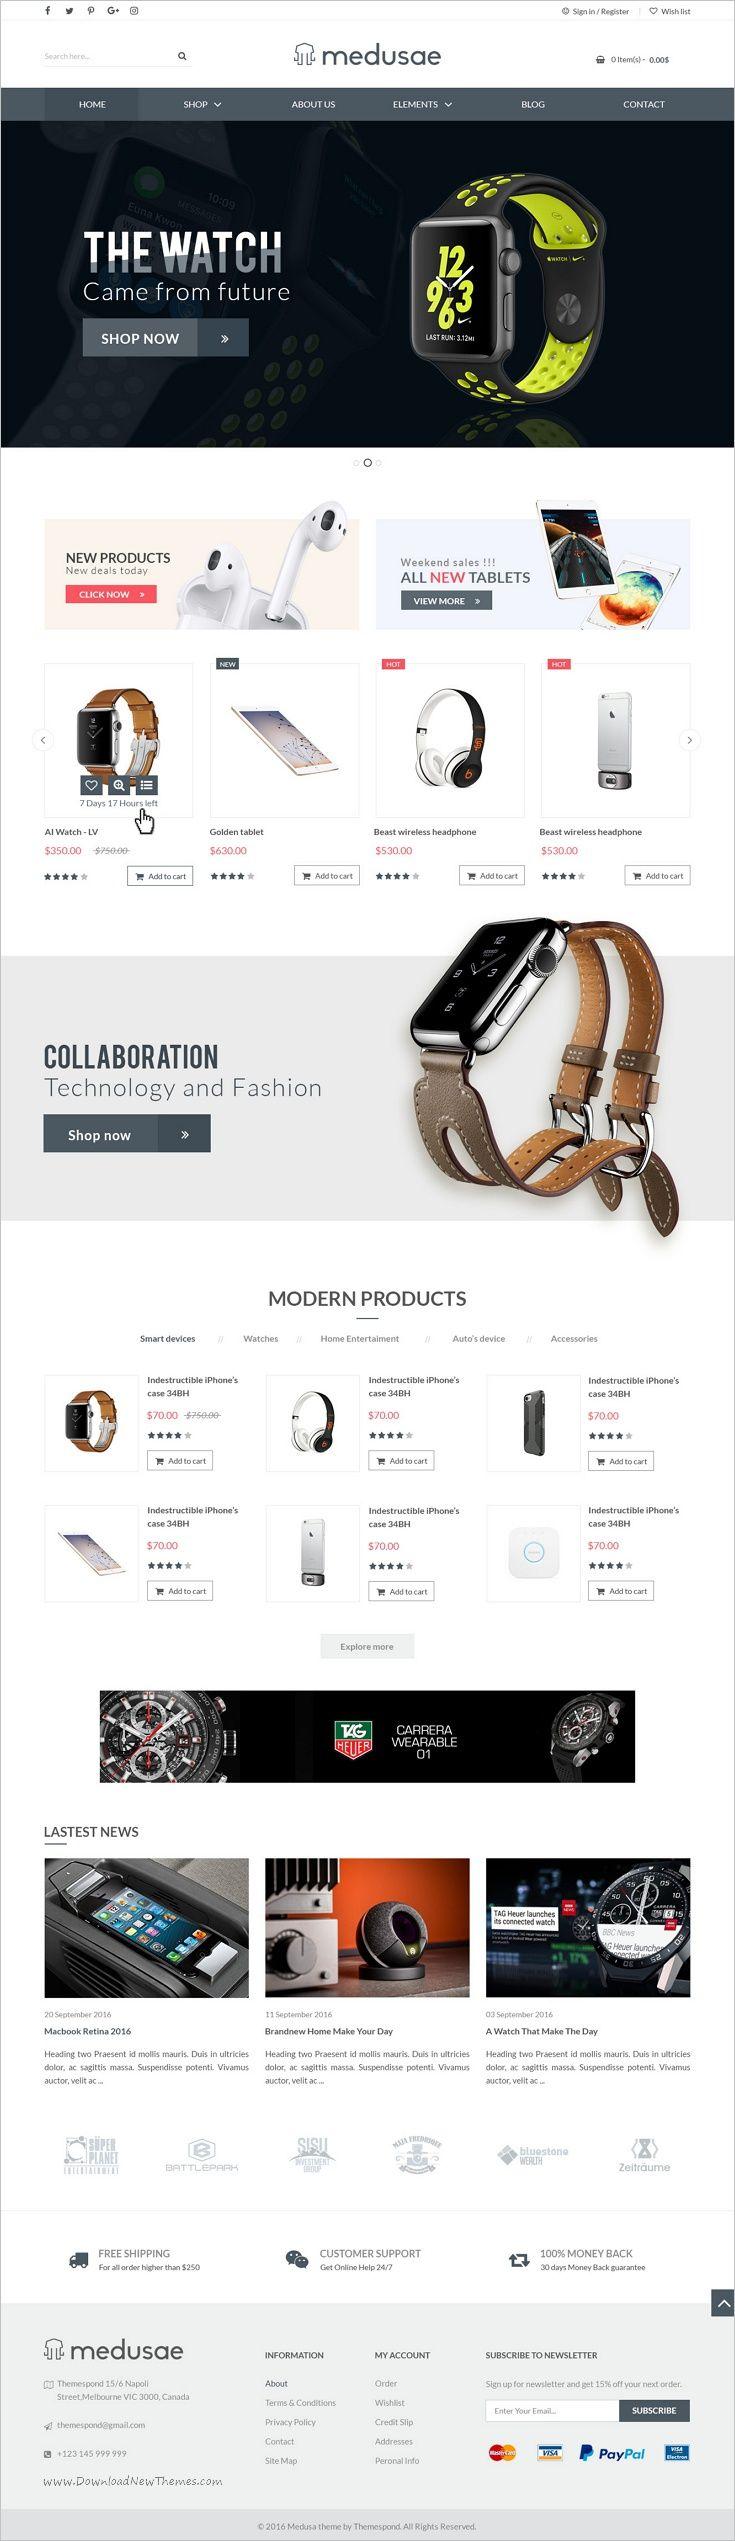 Medusae is an inspiration #Photoshop template for 3in1 #tech #store eCommerce website download now➩ https://themeforest.net/item/medusae-ecommerce-multipurpose-psd-template/17511379?ref=Datasata